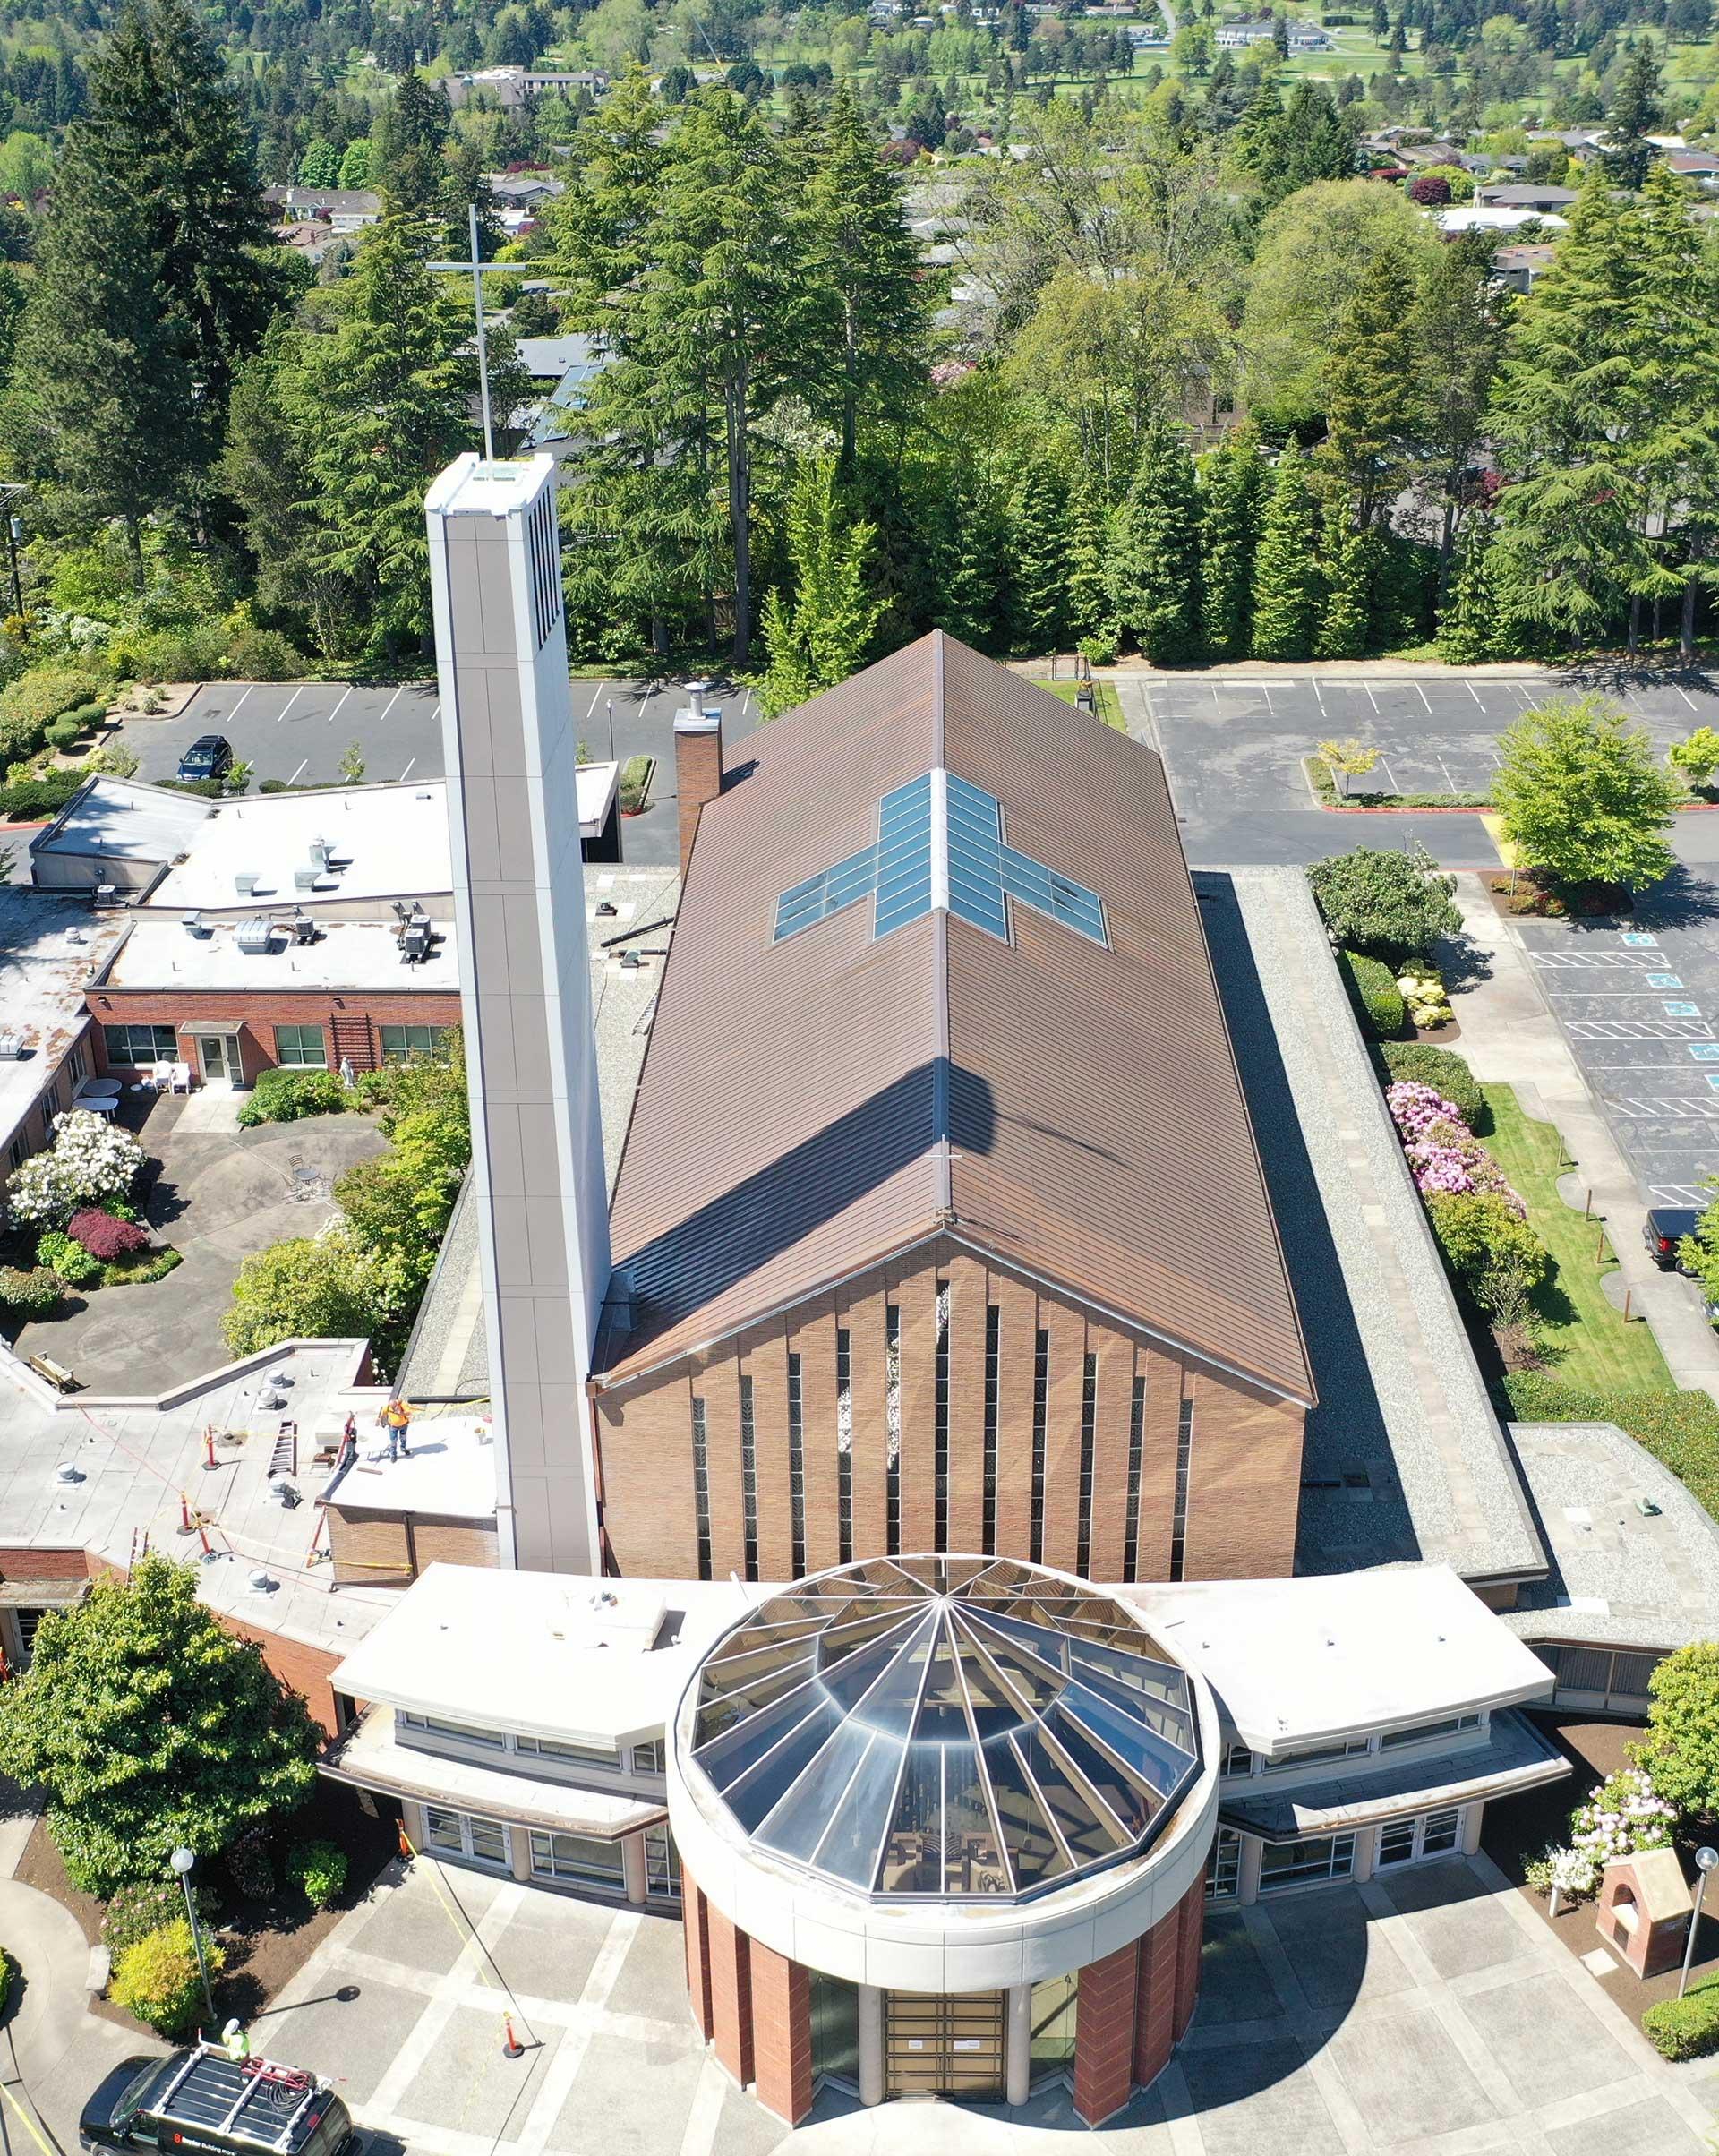 https://www.goudycc.com/wp-content/uploads/2020/12/sacred-heart-church-1.jpg